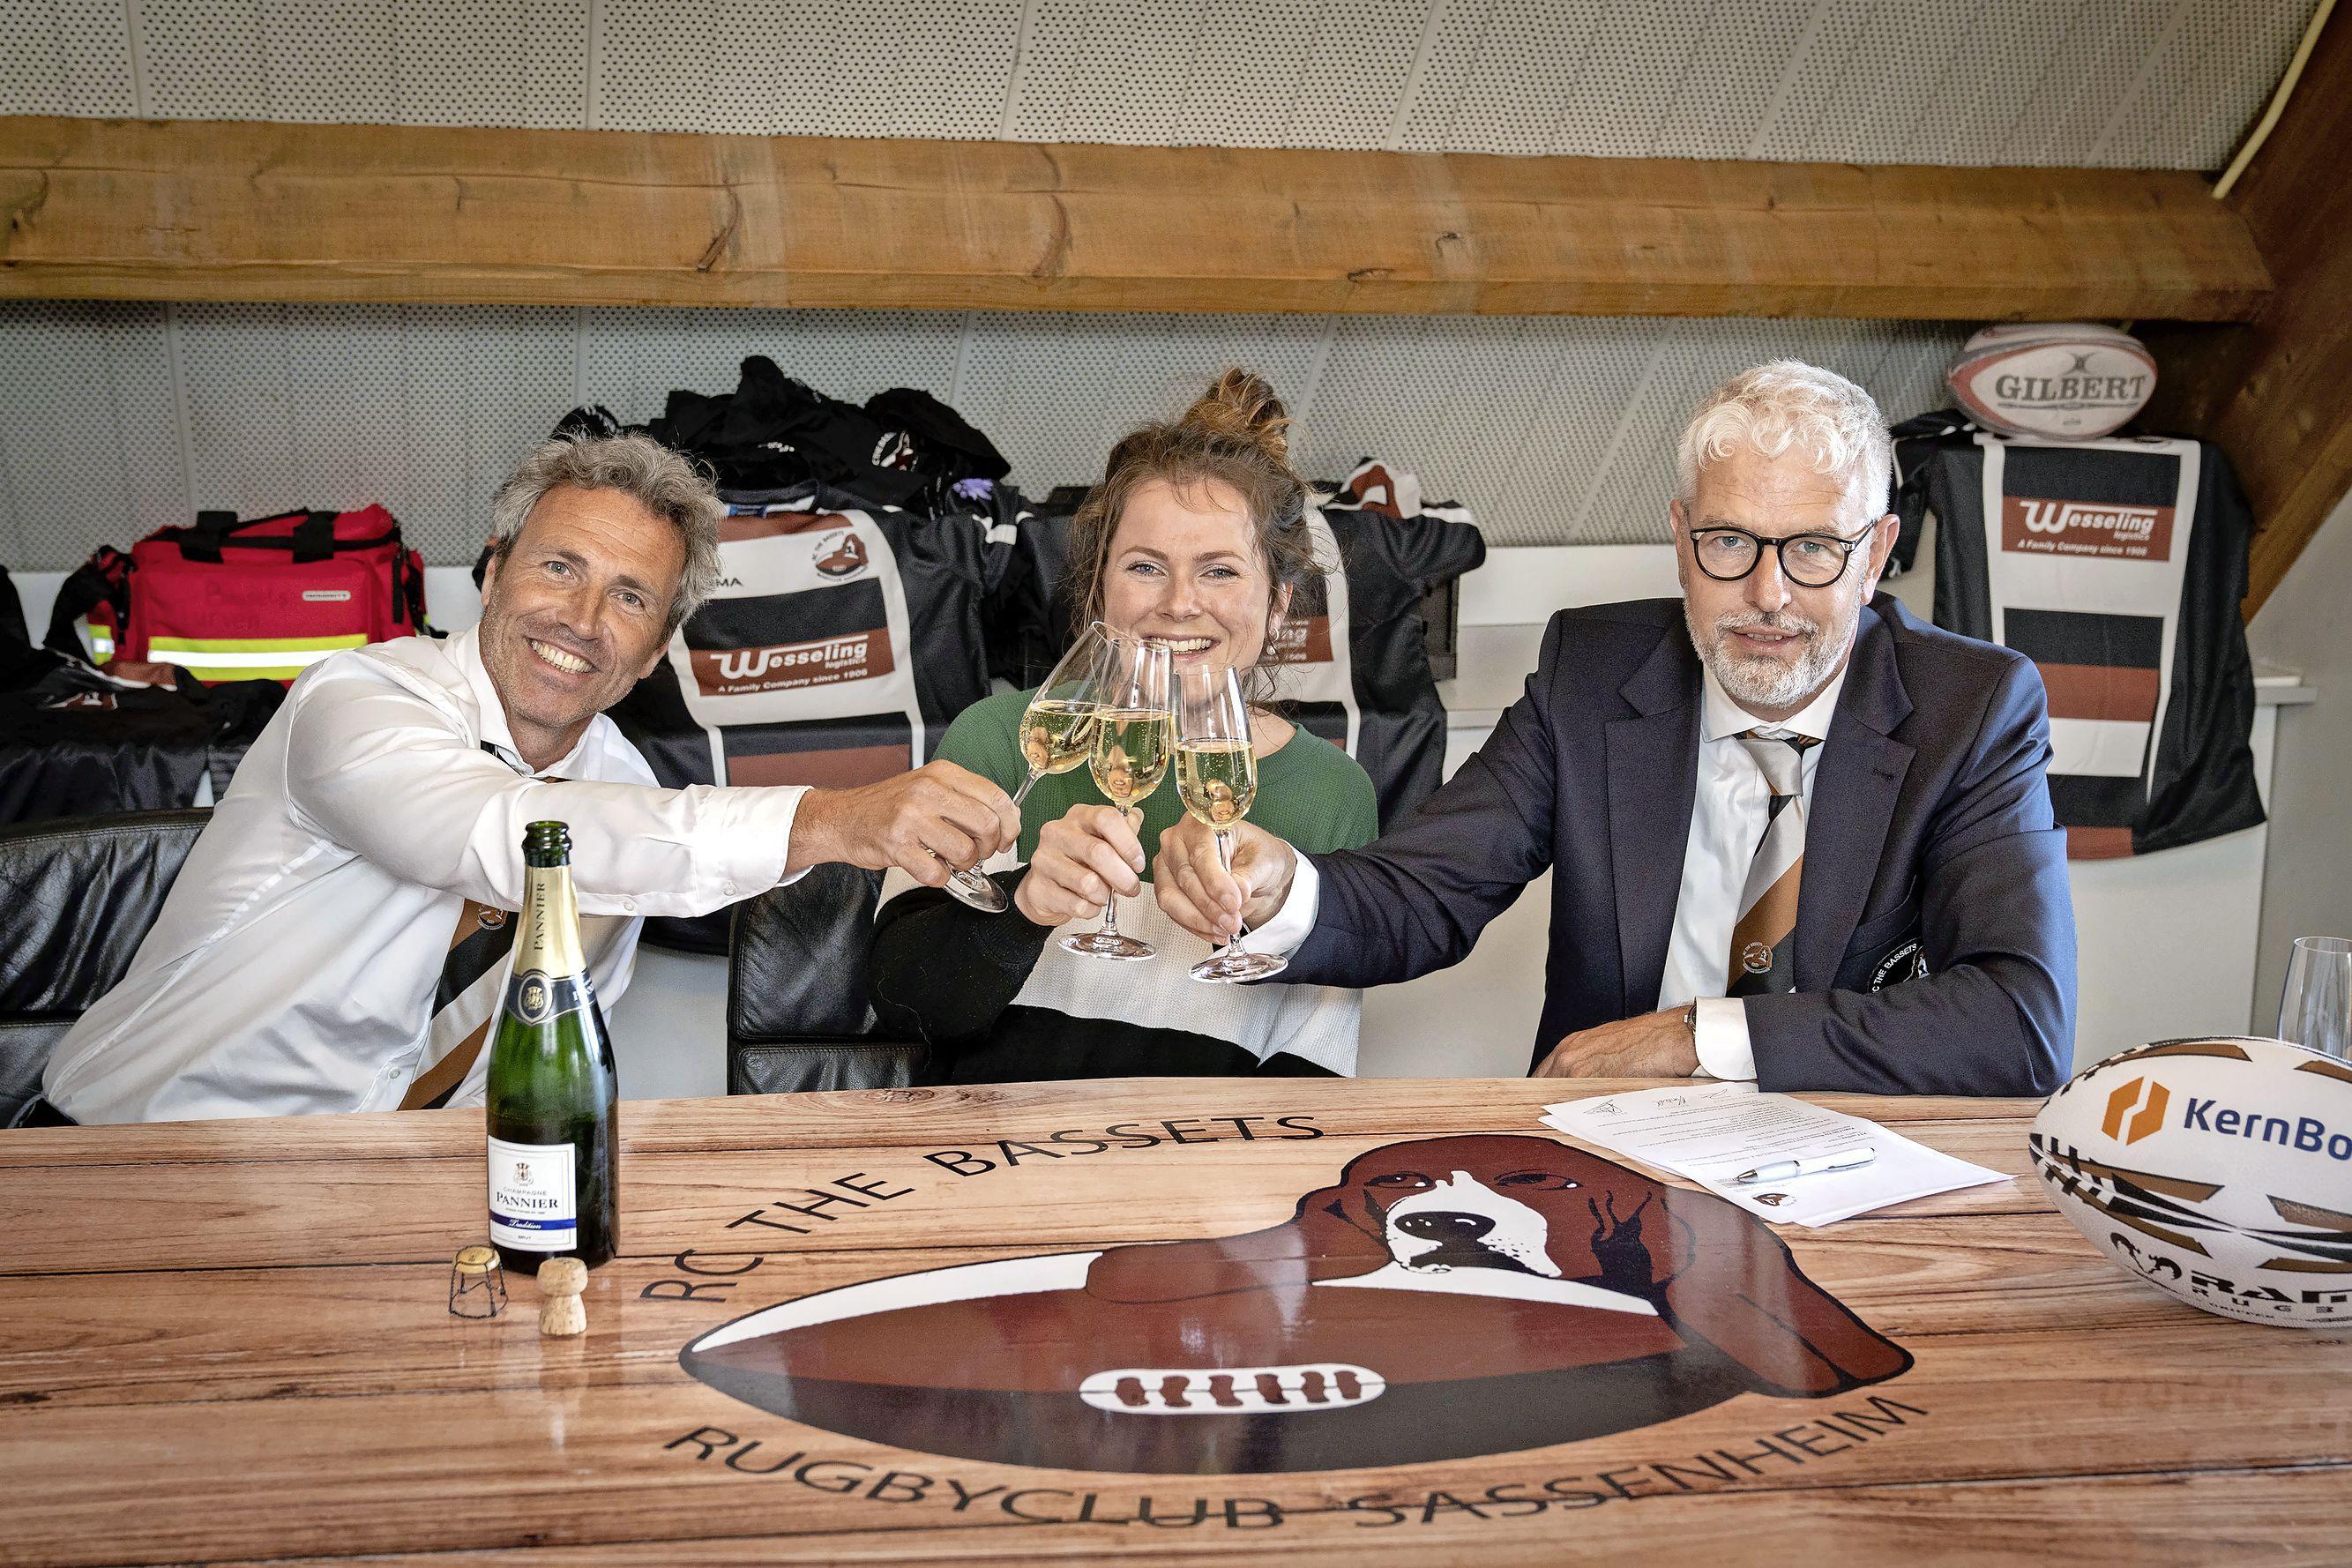 Engelse Kathie Turnbull is de nieuwe ambitieuze hoofdcoach van rugbyclub The Bassets